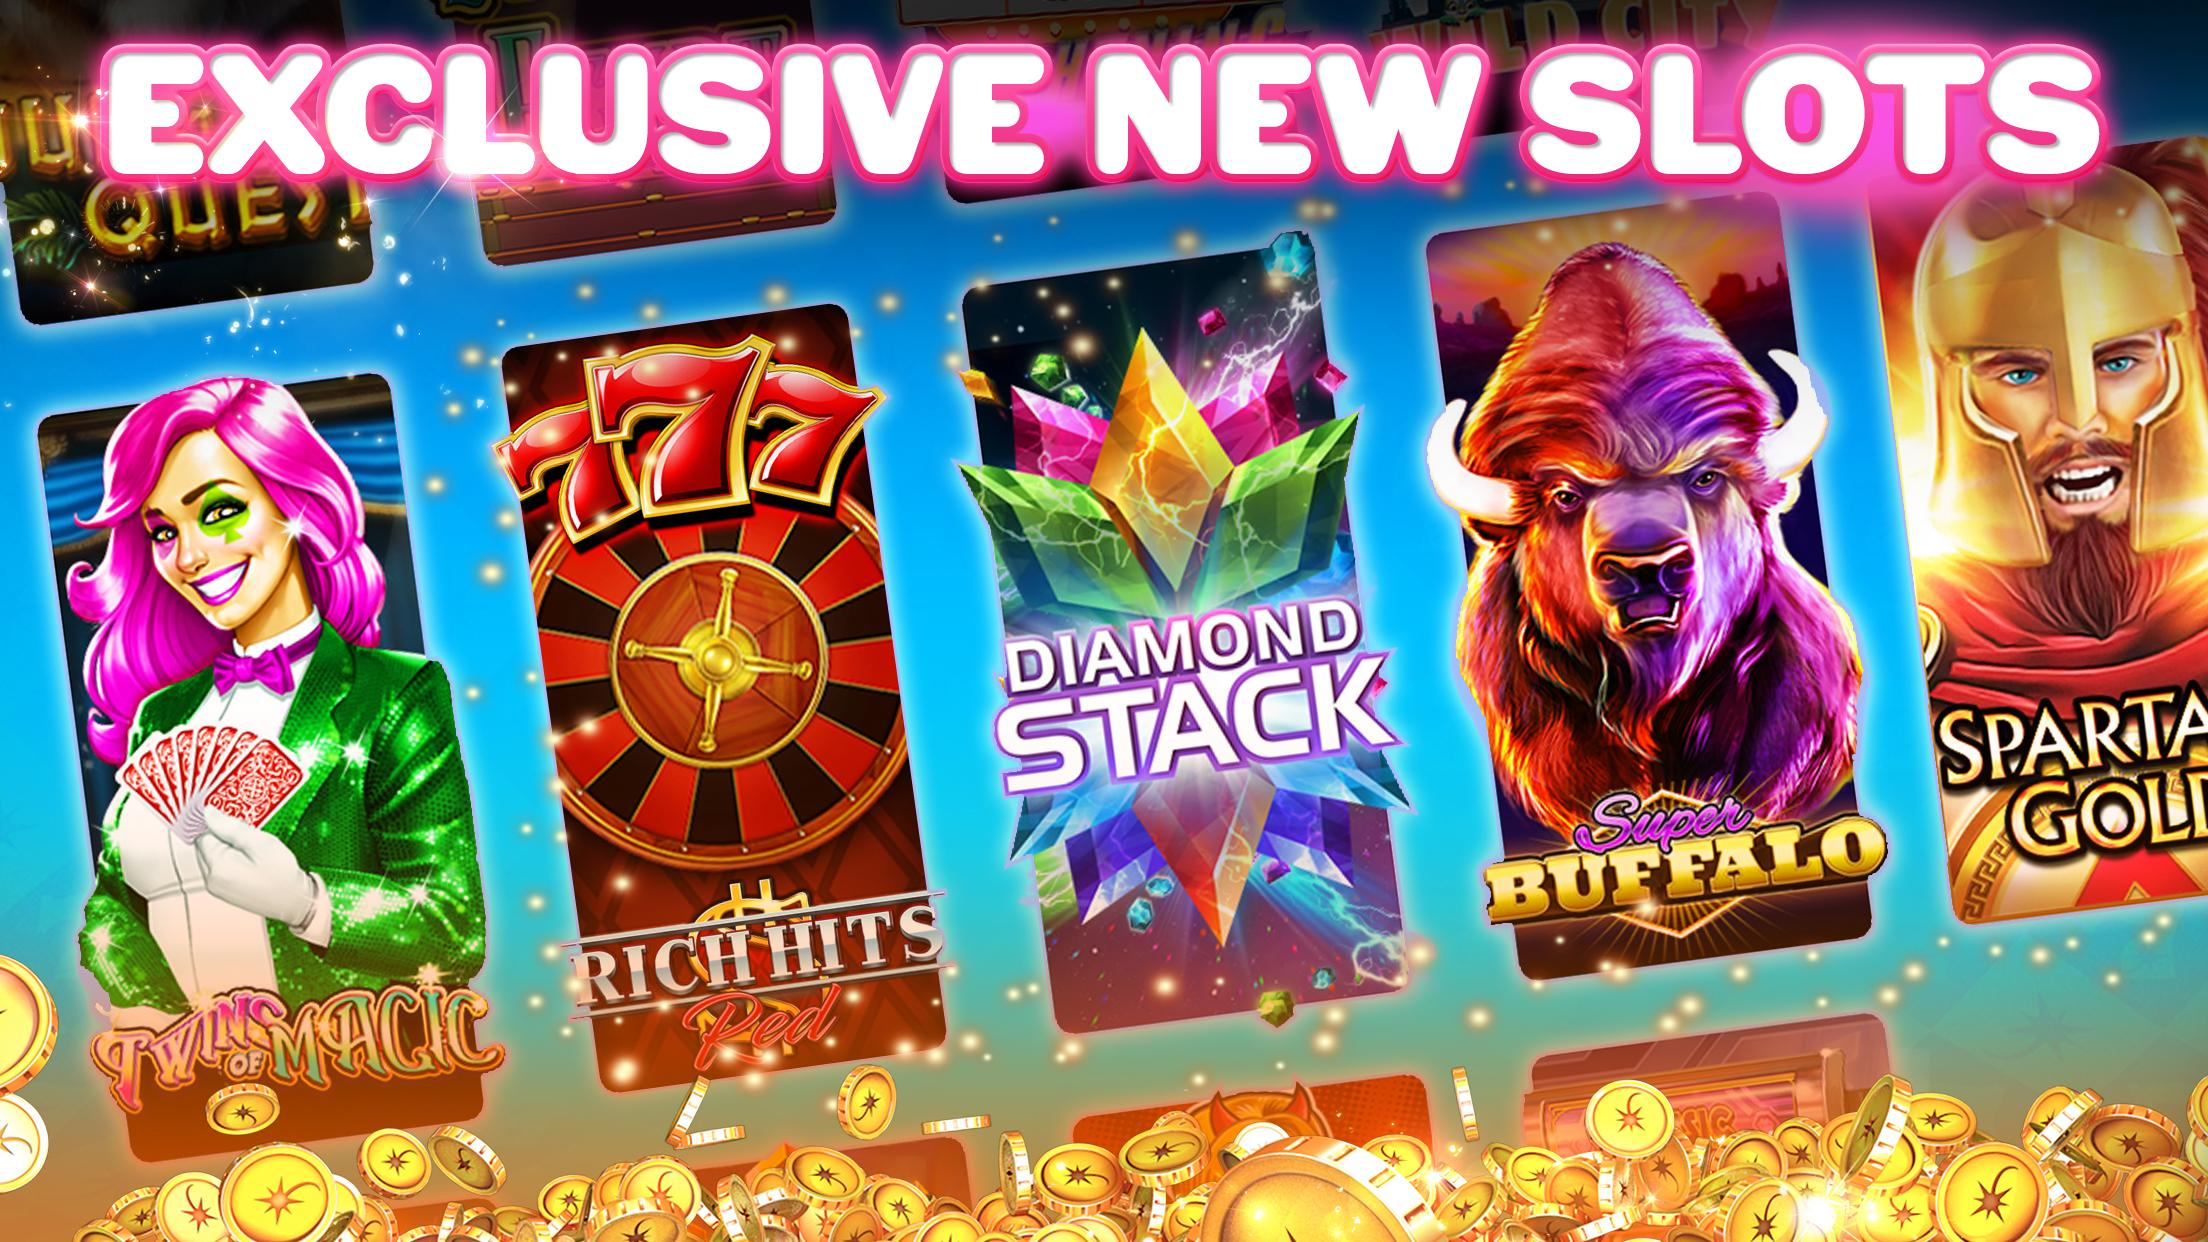 Jackpotjoy Slots Slot machines with Bonus Games 26.0.05 Screenshot 7